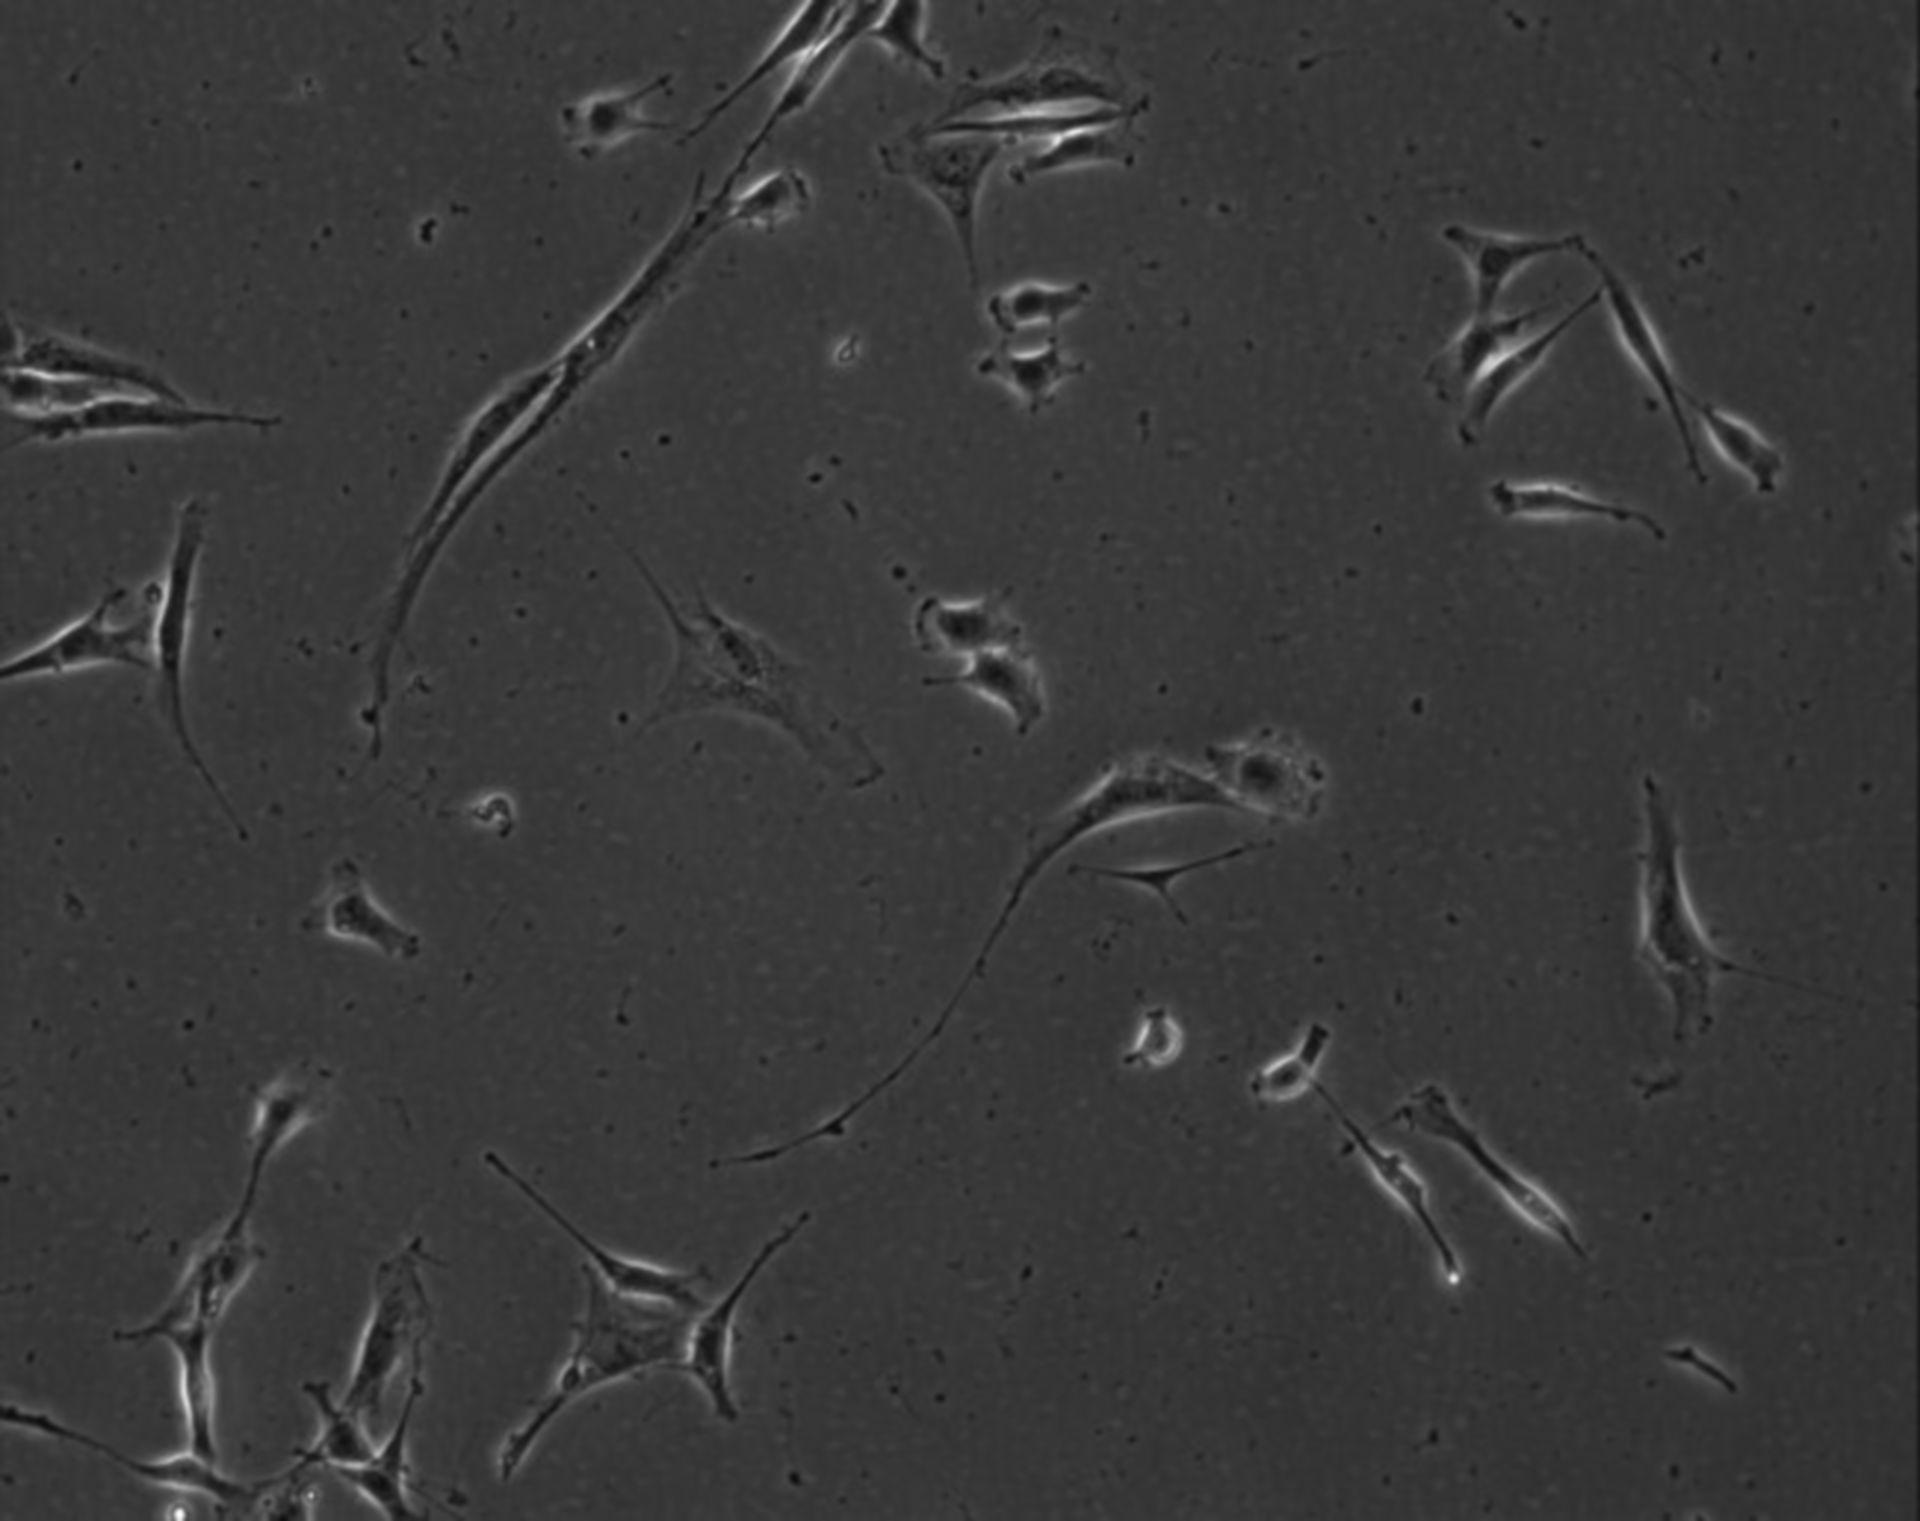 Mus musculus (Extracellular matrix part) - CIL:8993